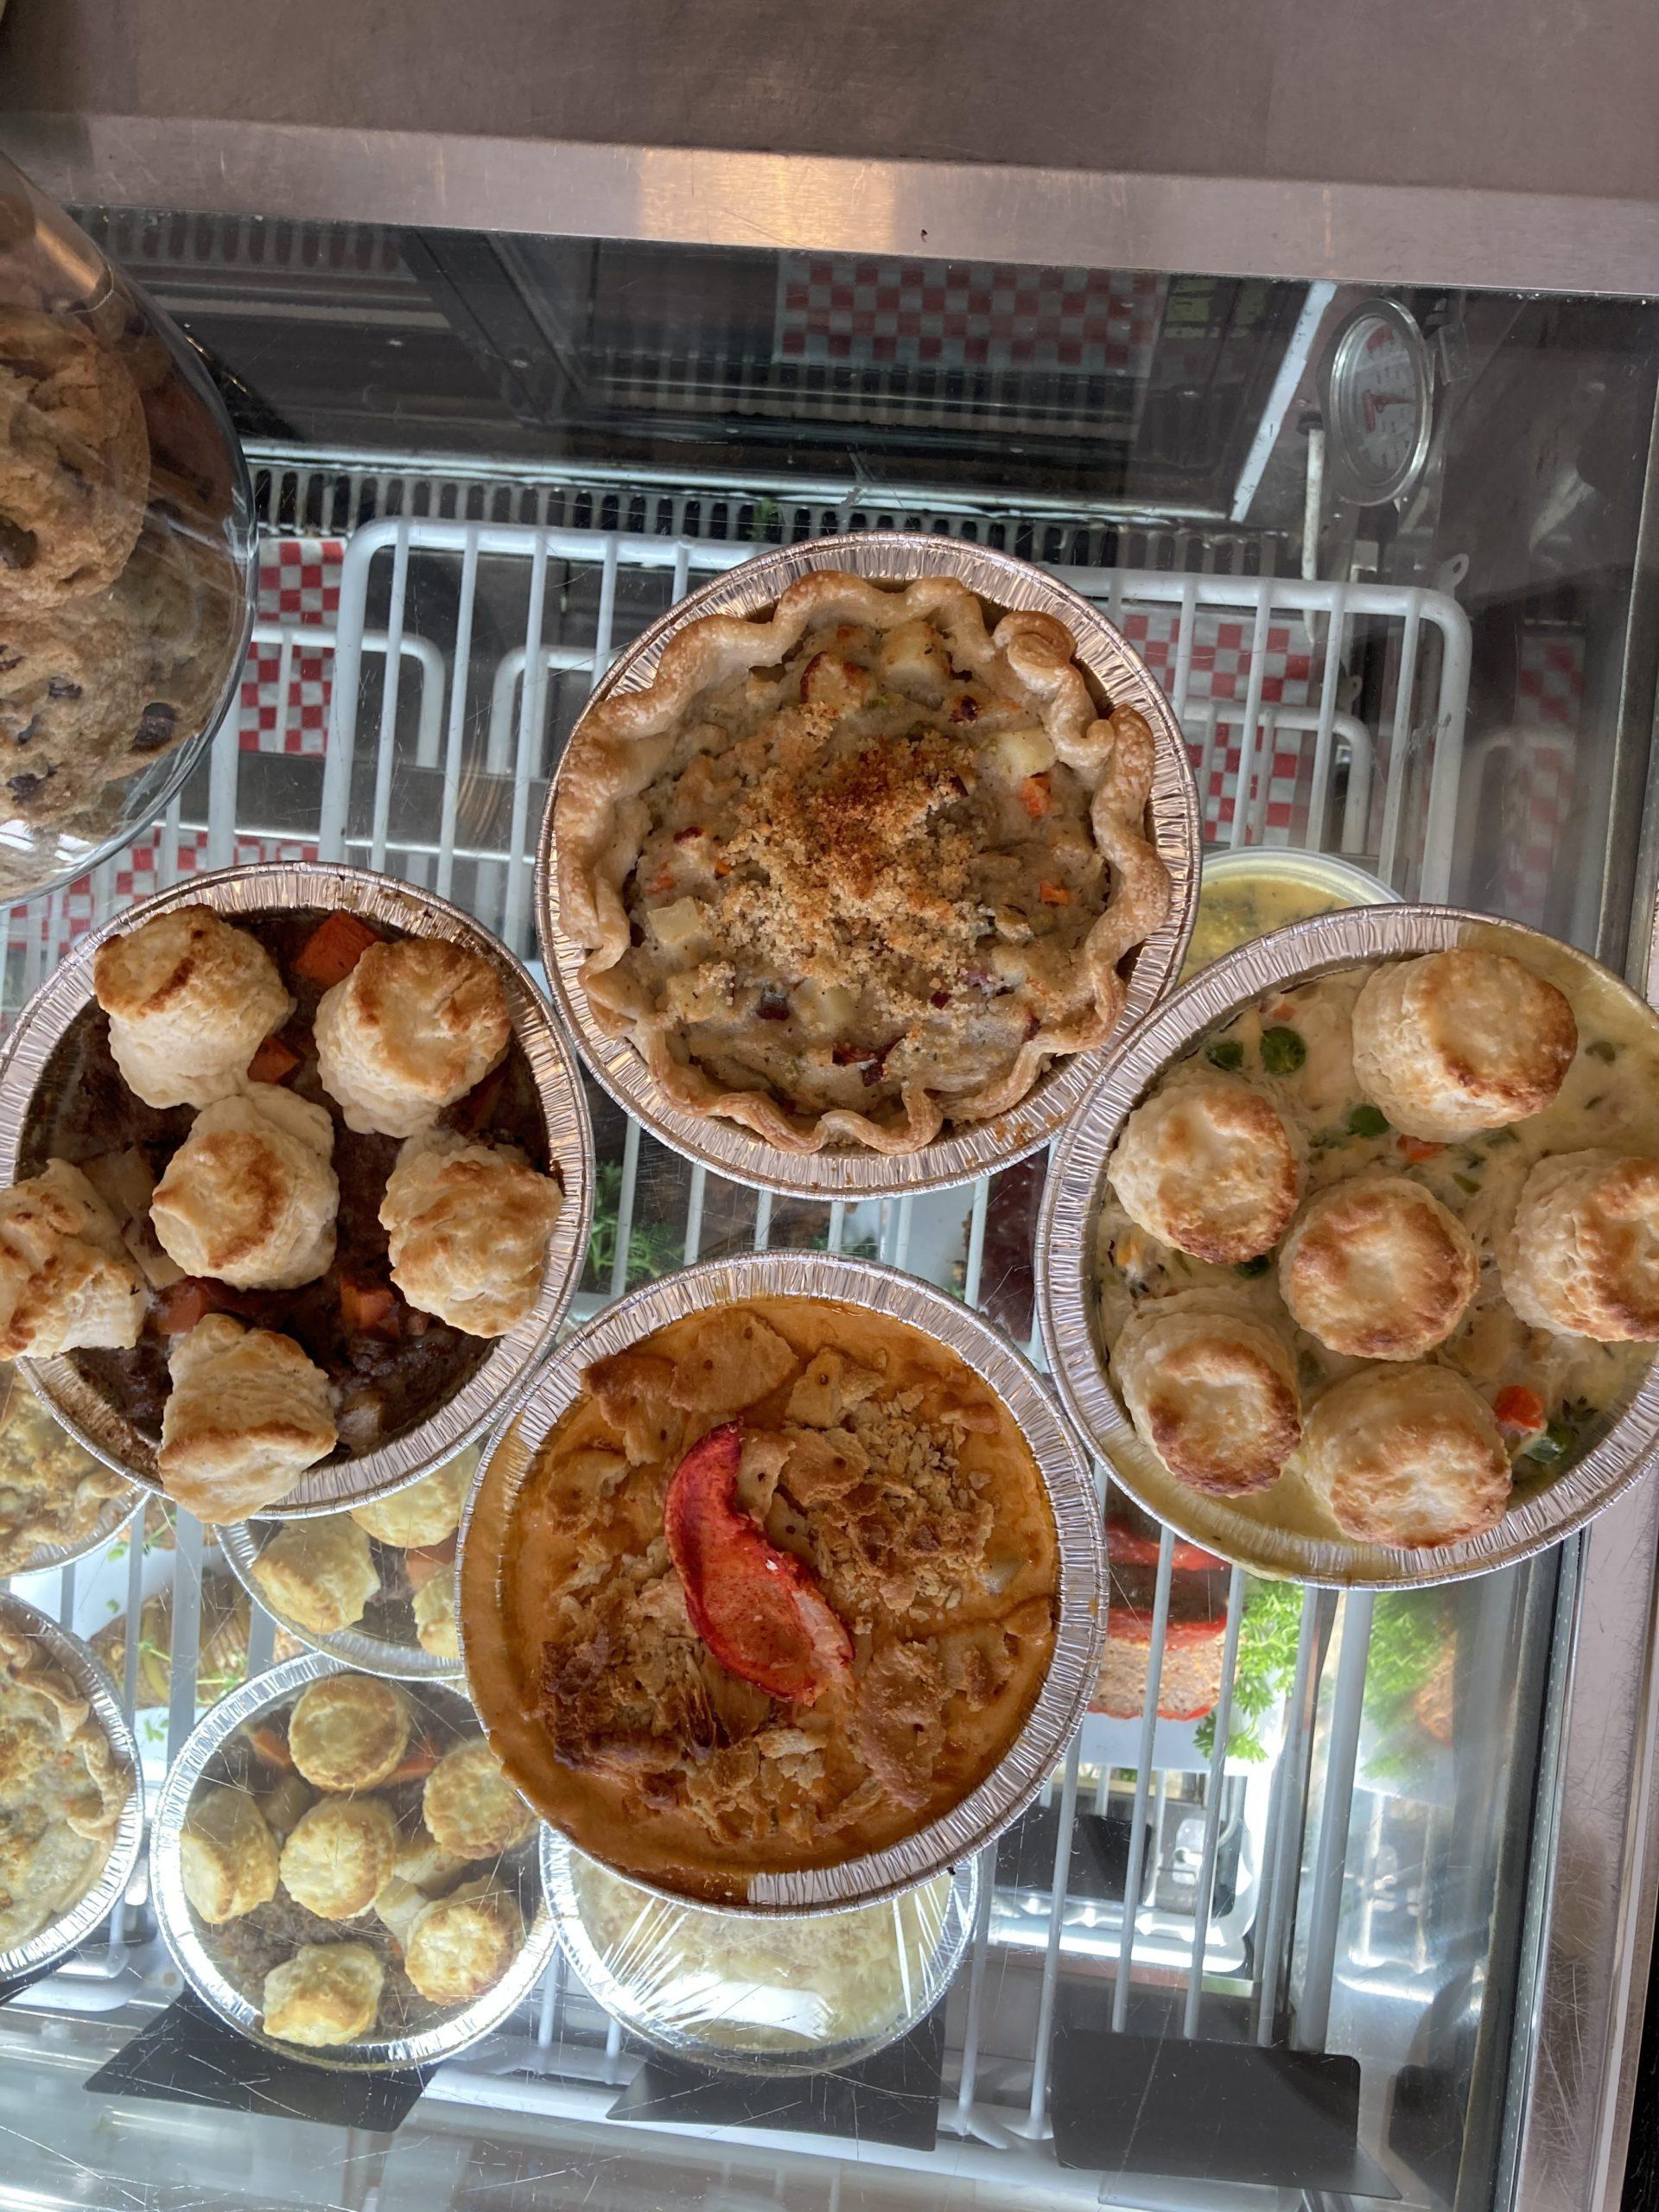 A selection of Bostwick's Market offerings.